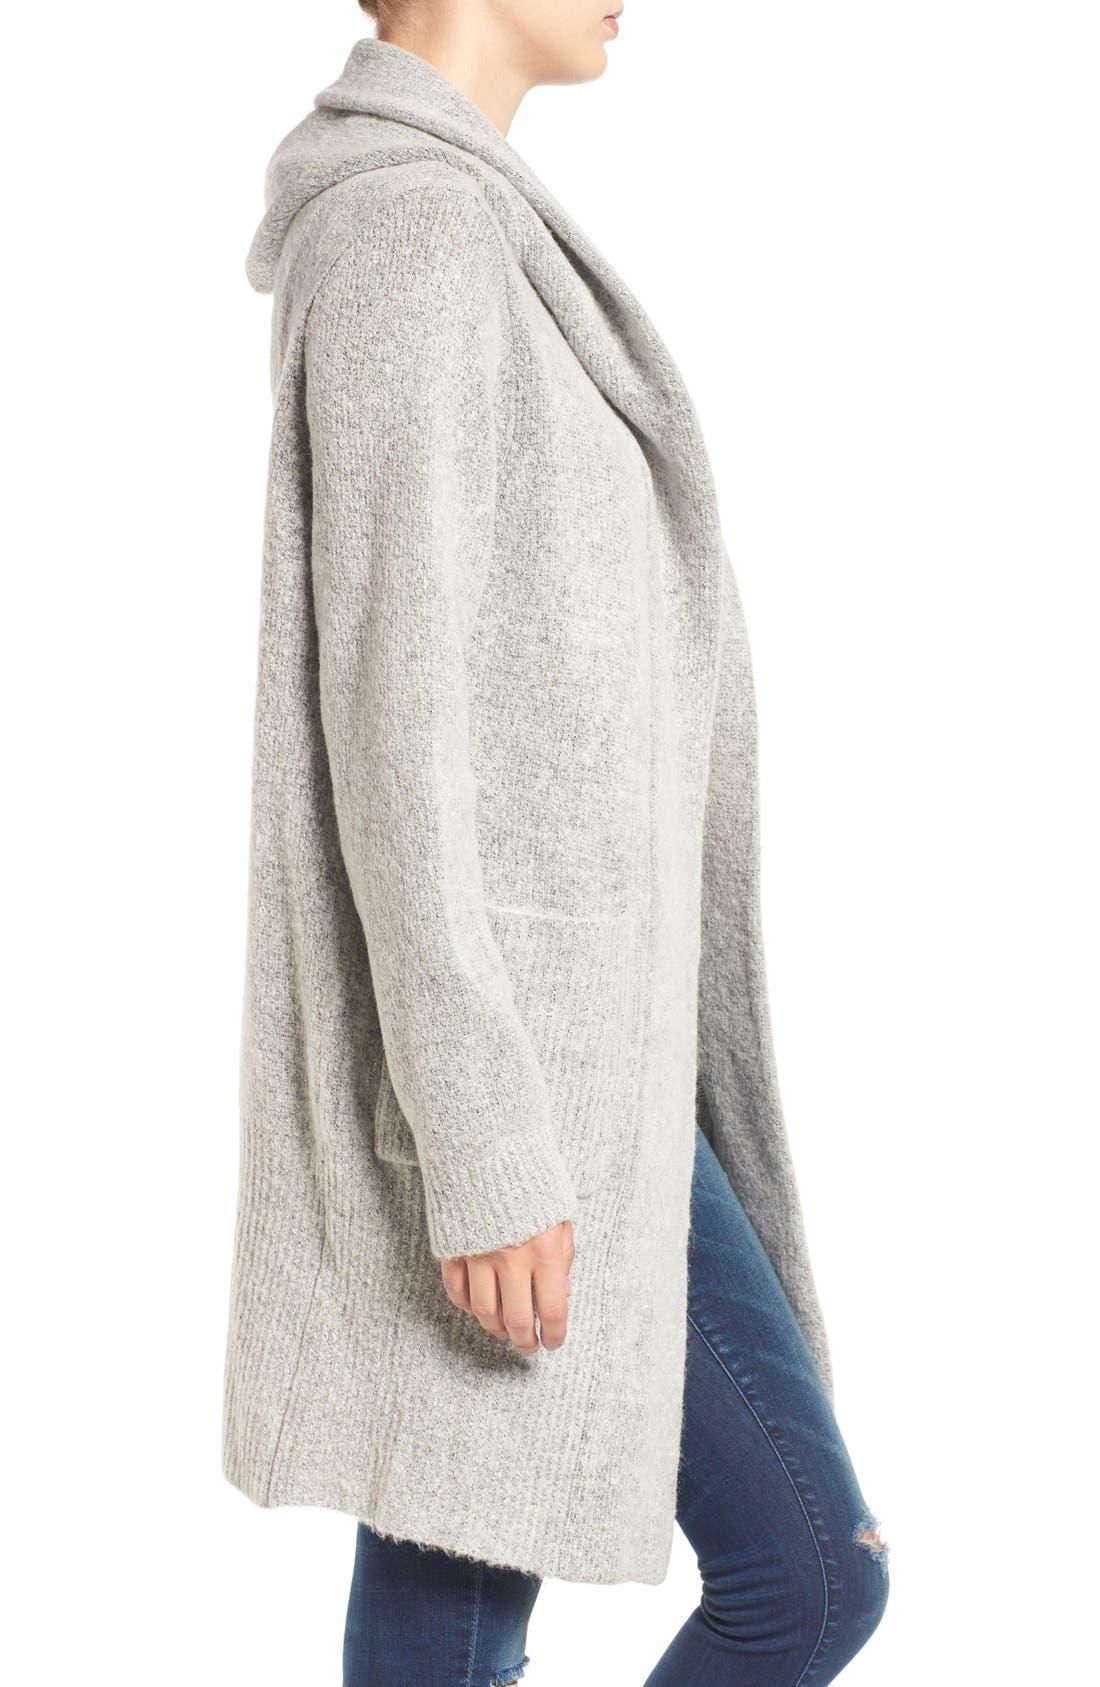 Alternate Image 3  - BLANKNYC 'Textationship' Knit Hooded Cardigan